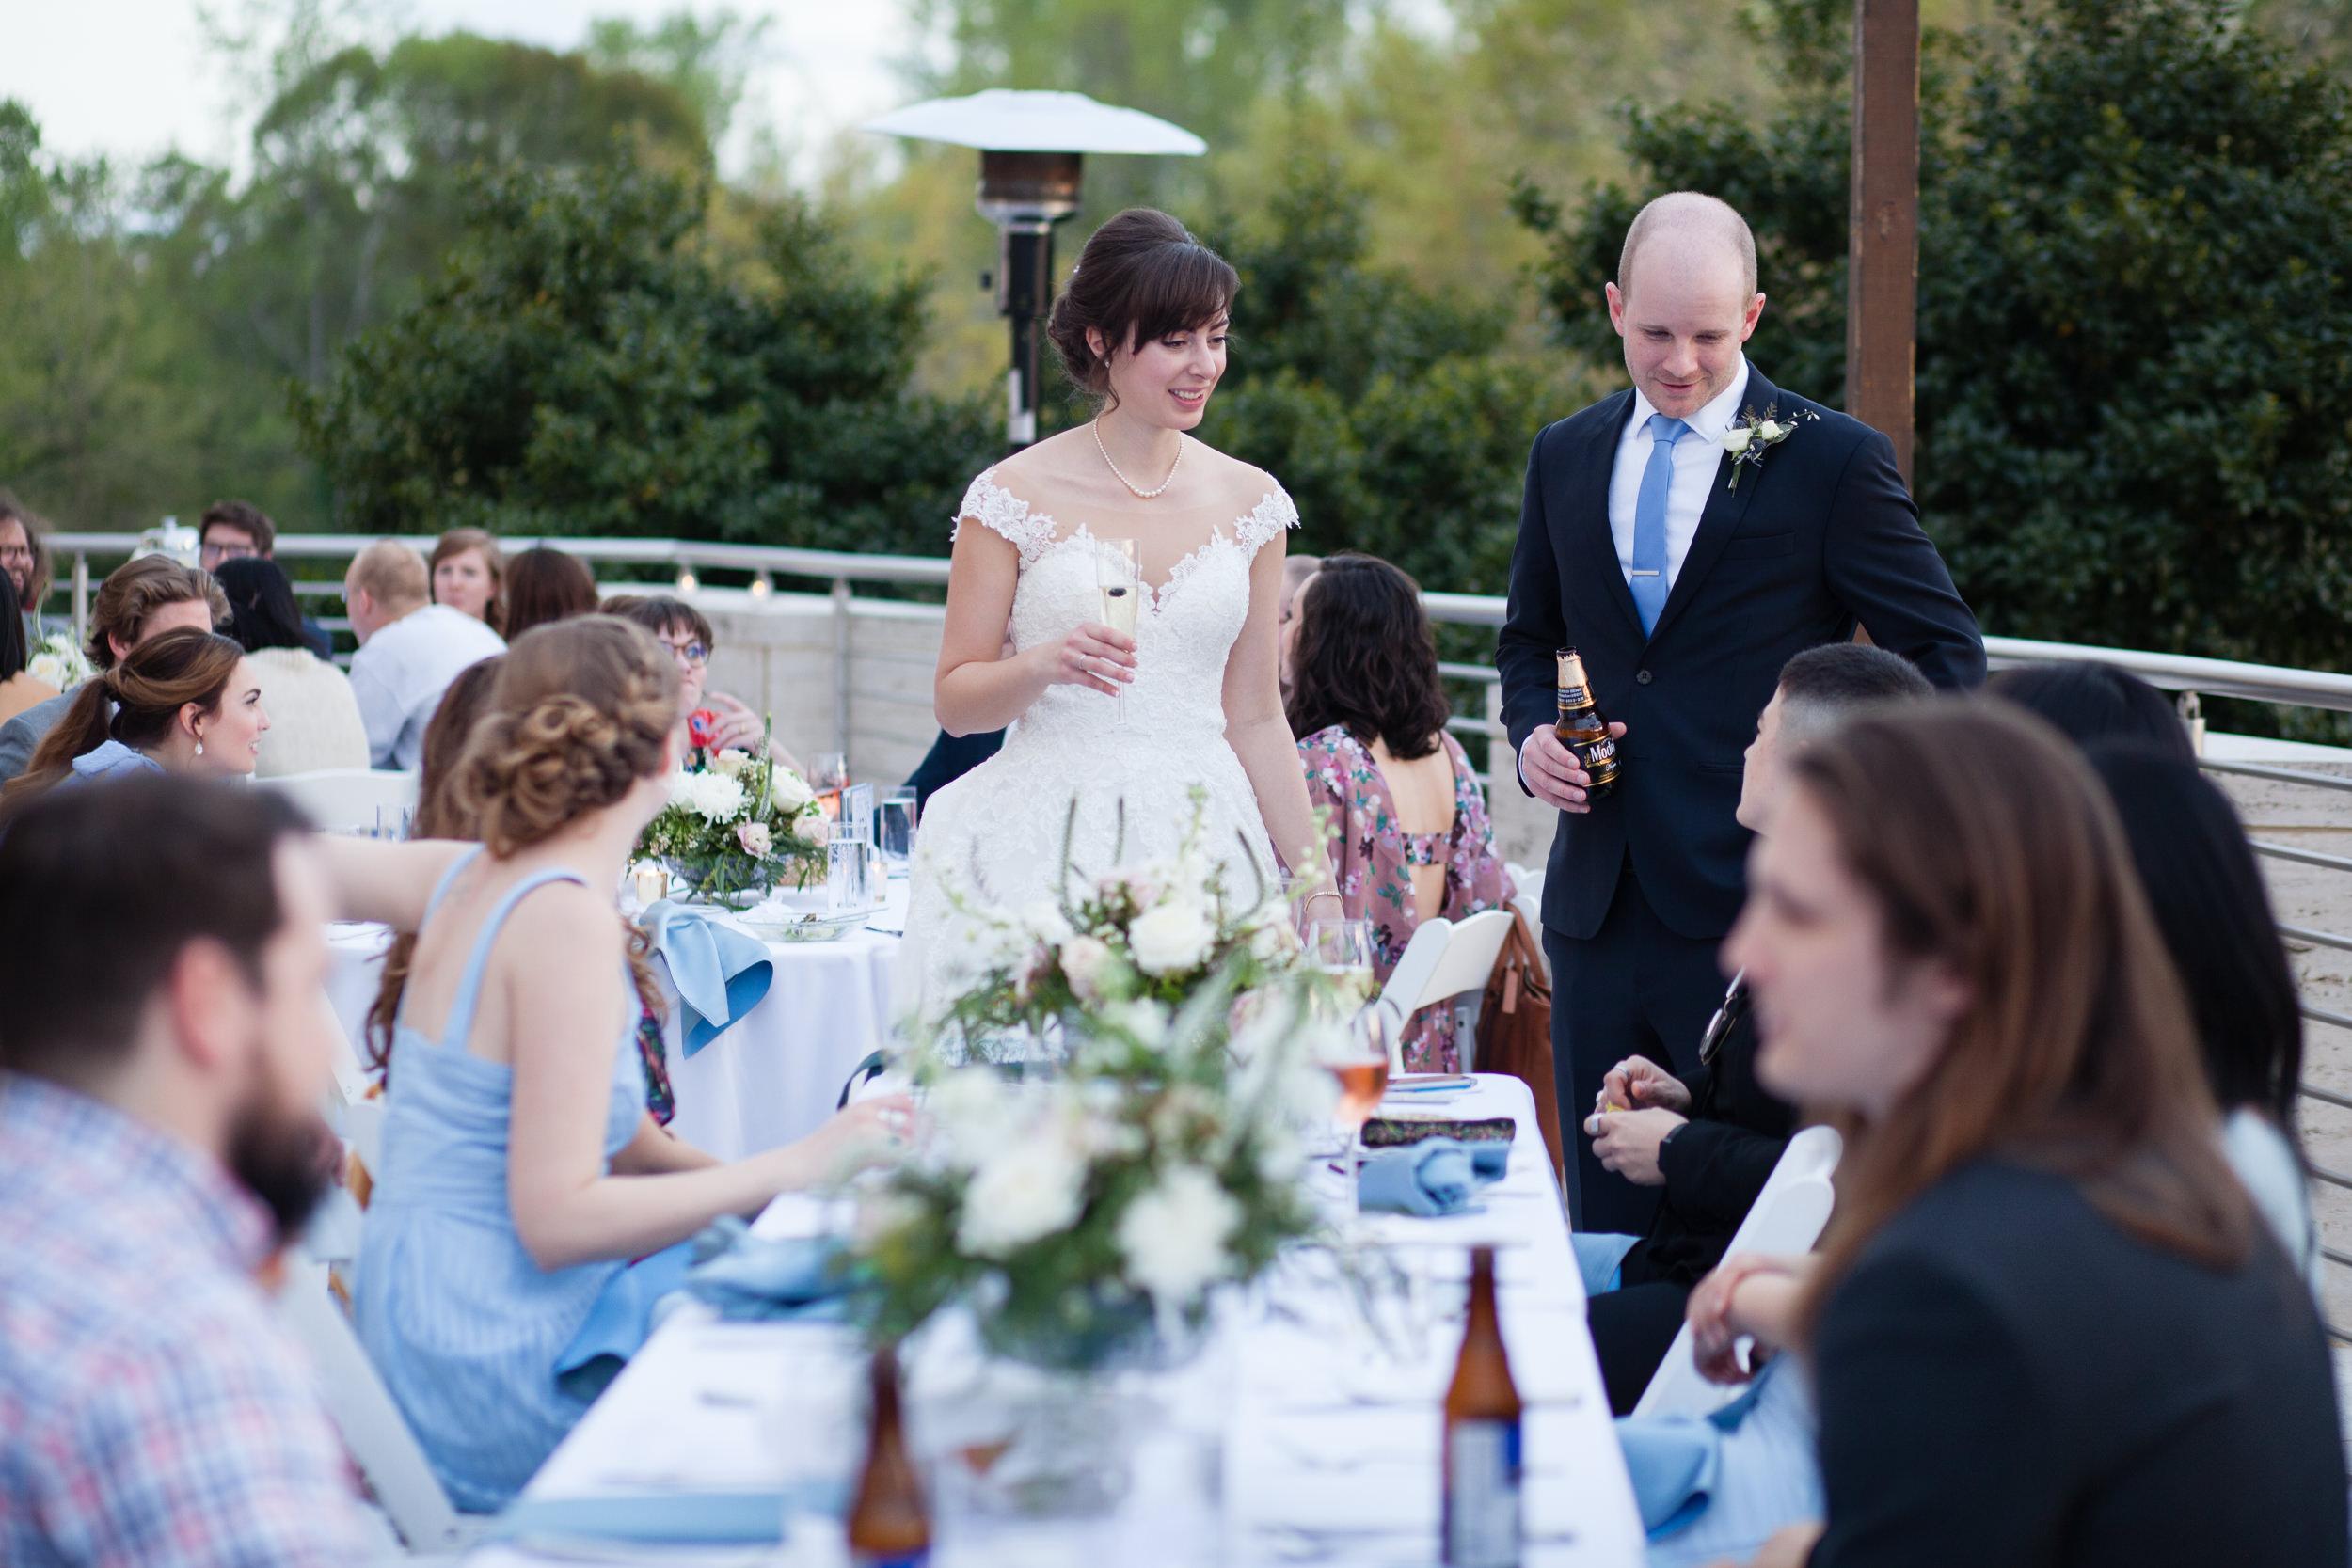 AB_Auburn_Wedding_2019-00071.jpg